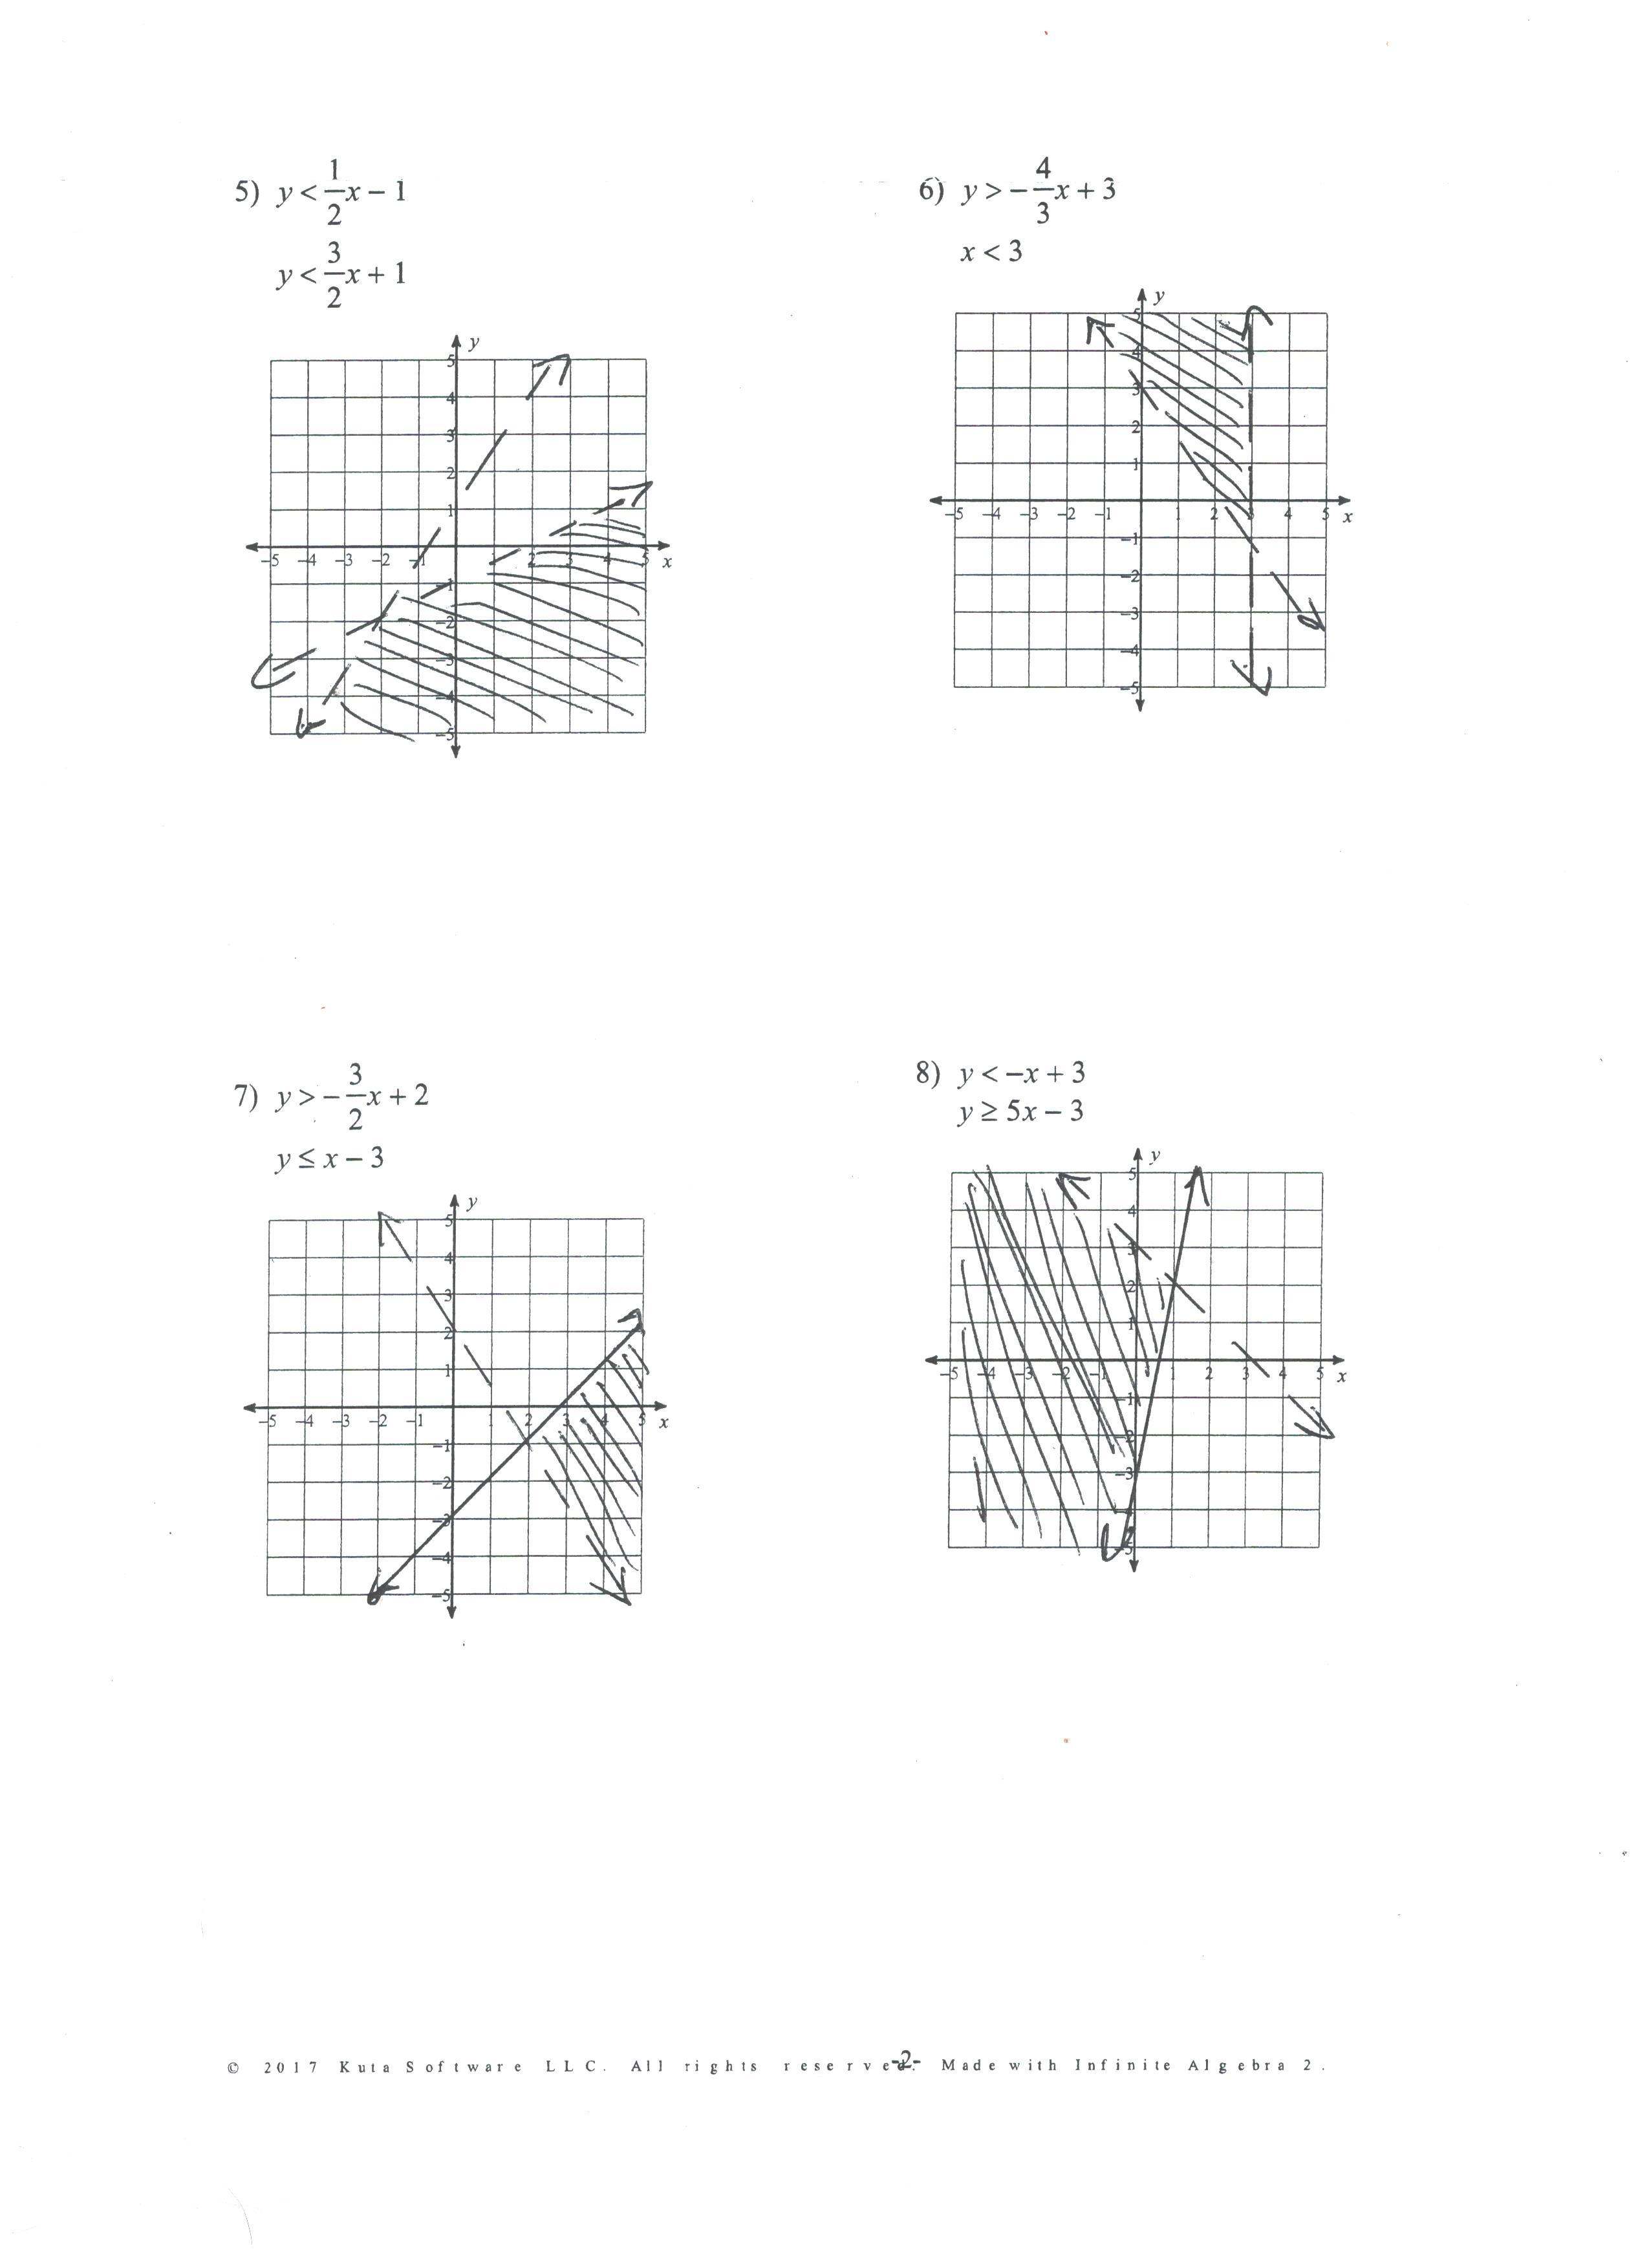 Honors Algebra Ii Assignments